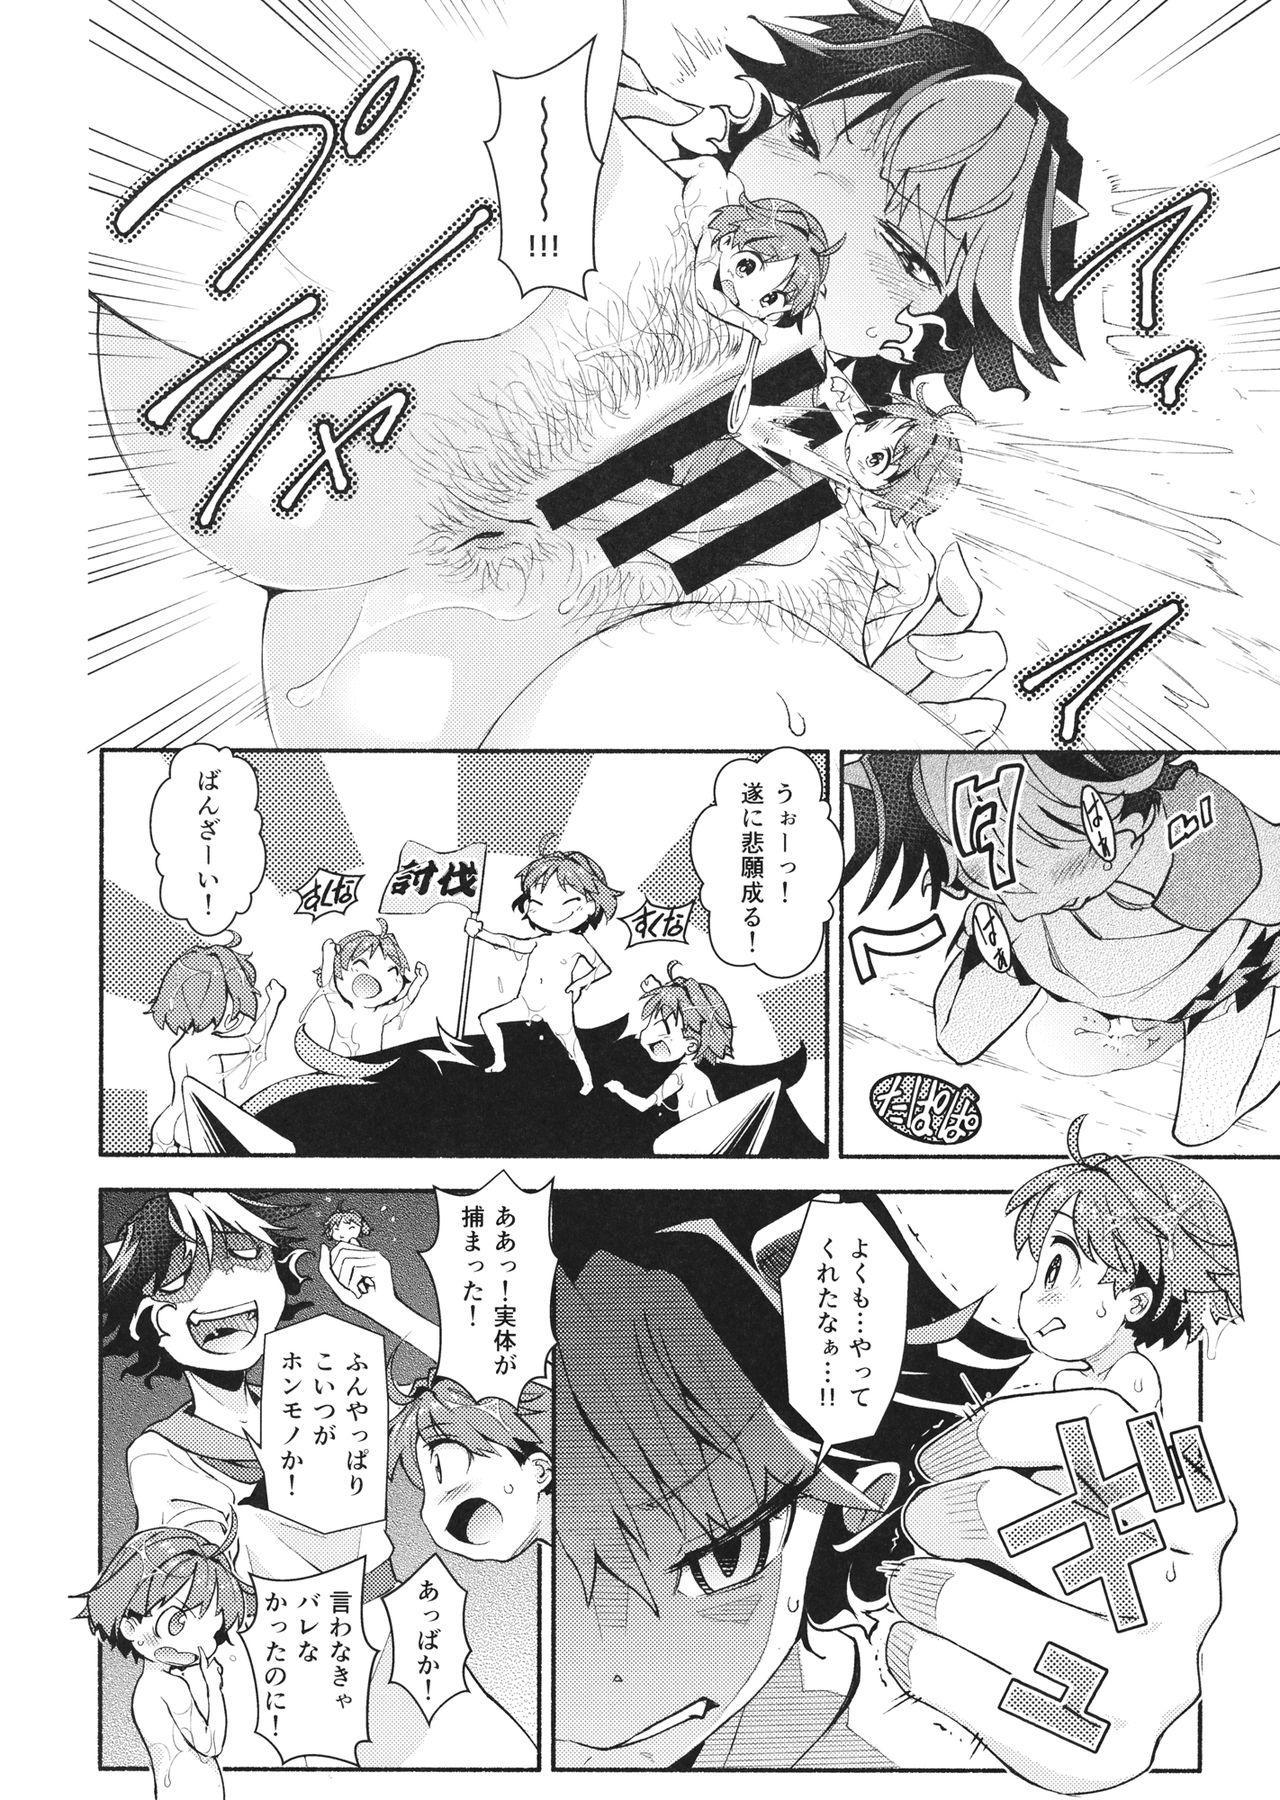 Touhou Amanojaku 16